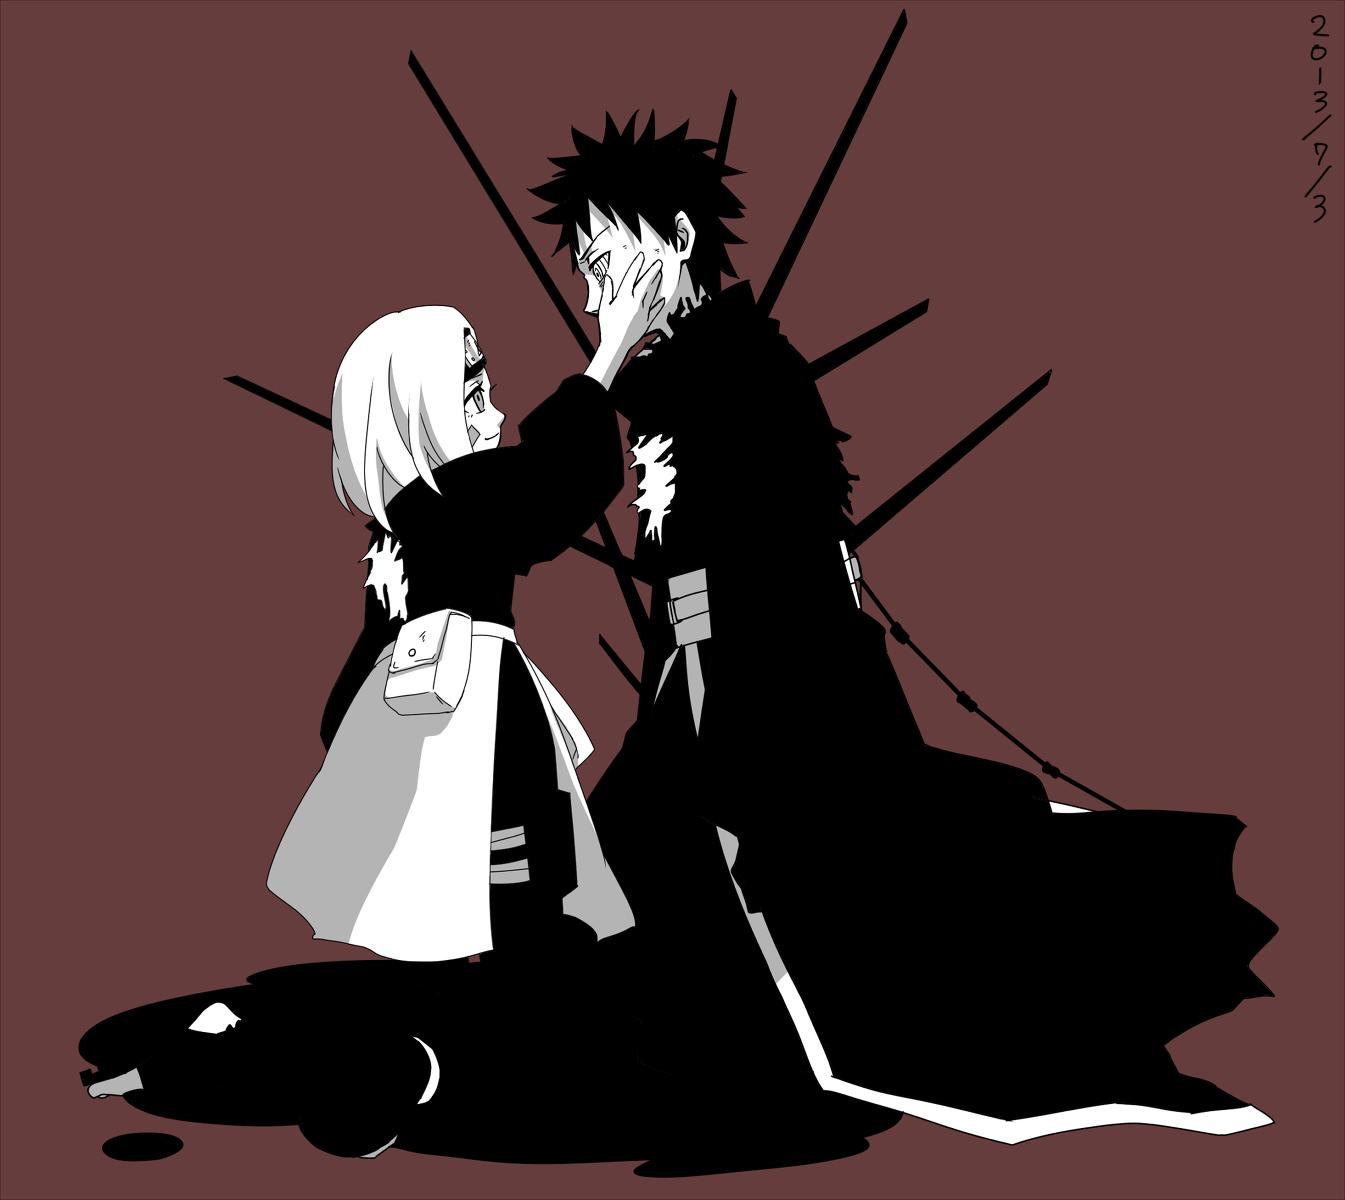 obito uchiha hình nền titled Obito Uchiha and Rin